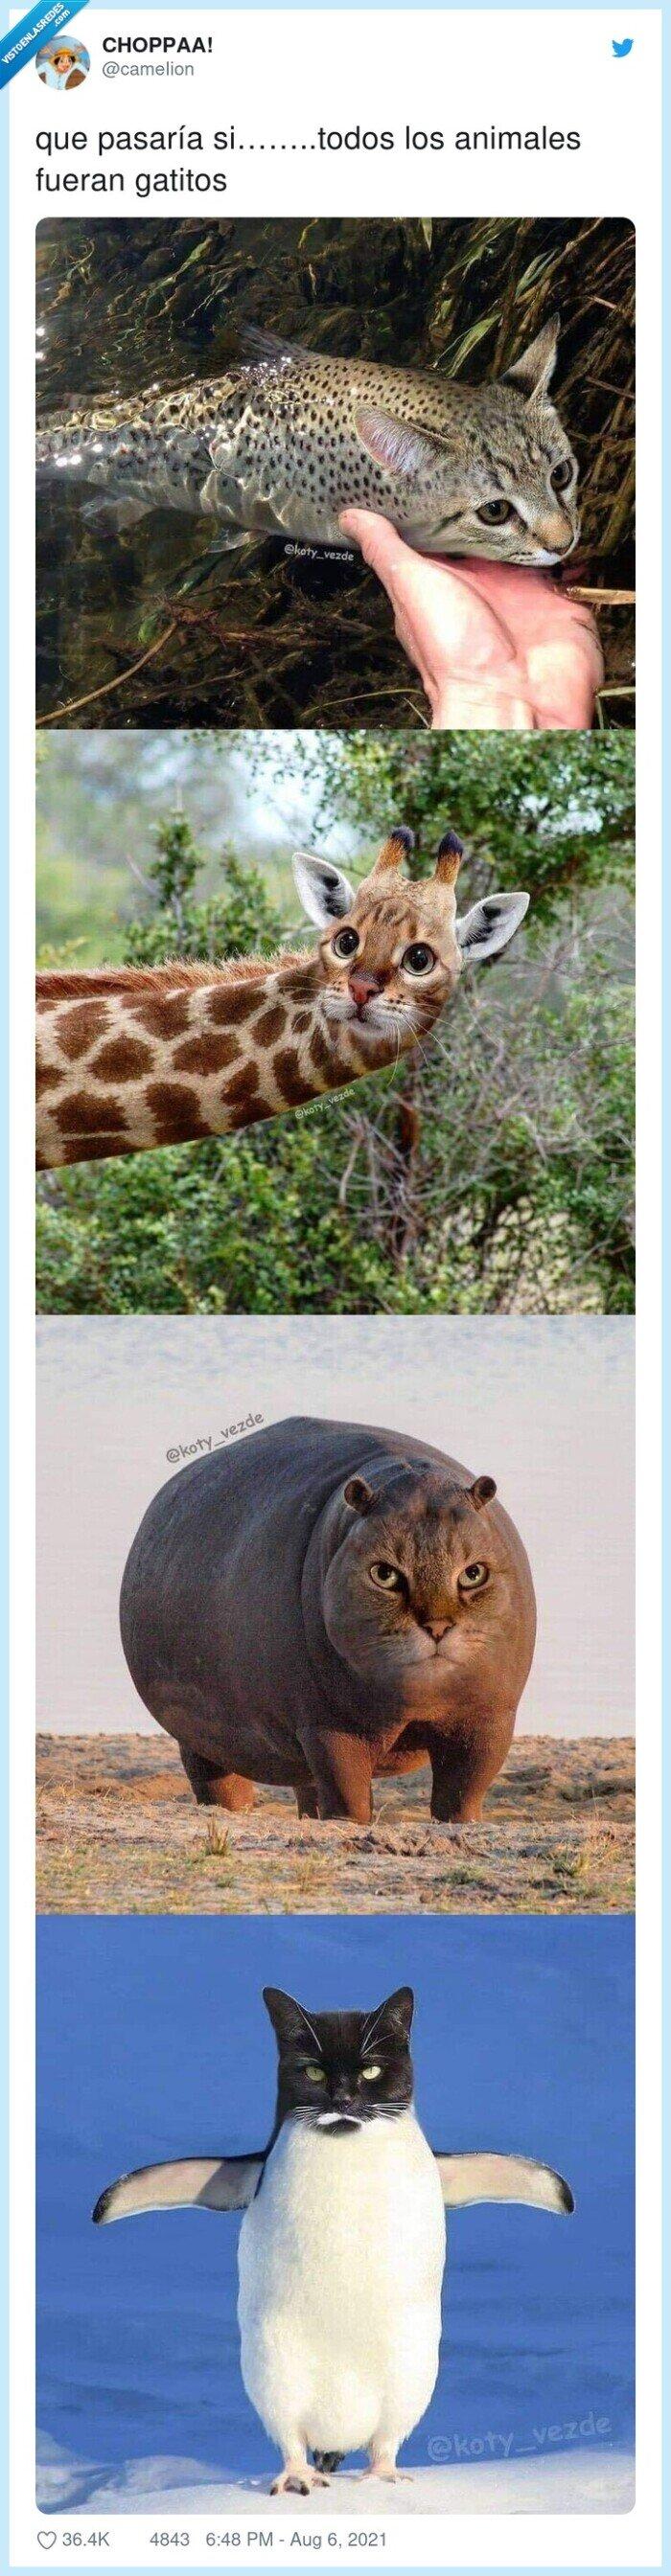 animales,gatos,todos